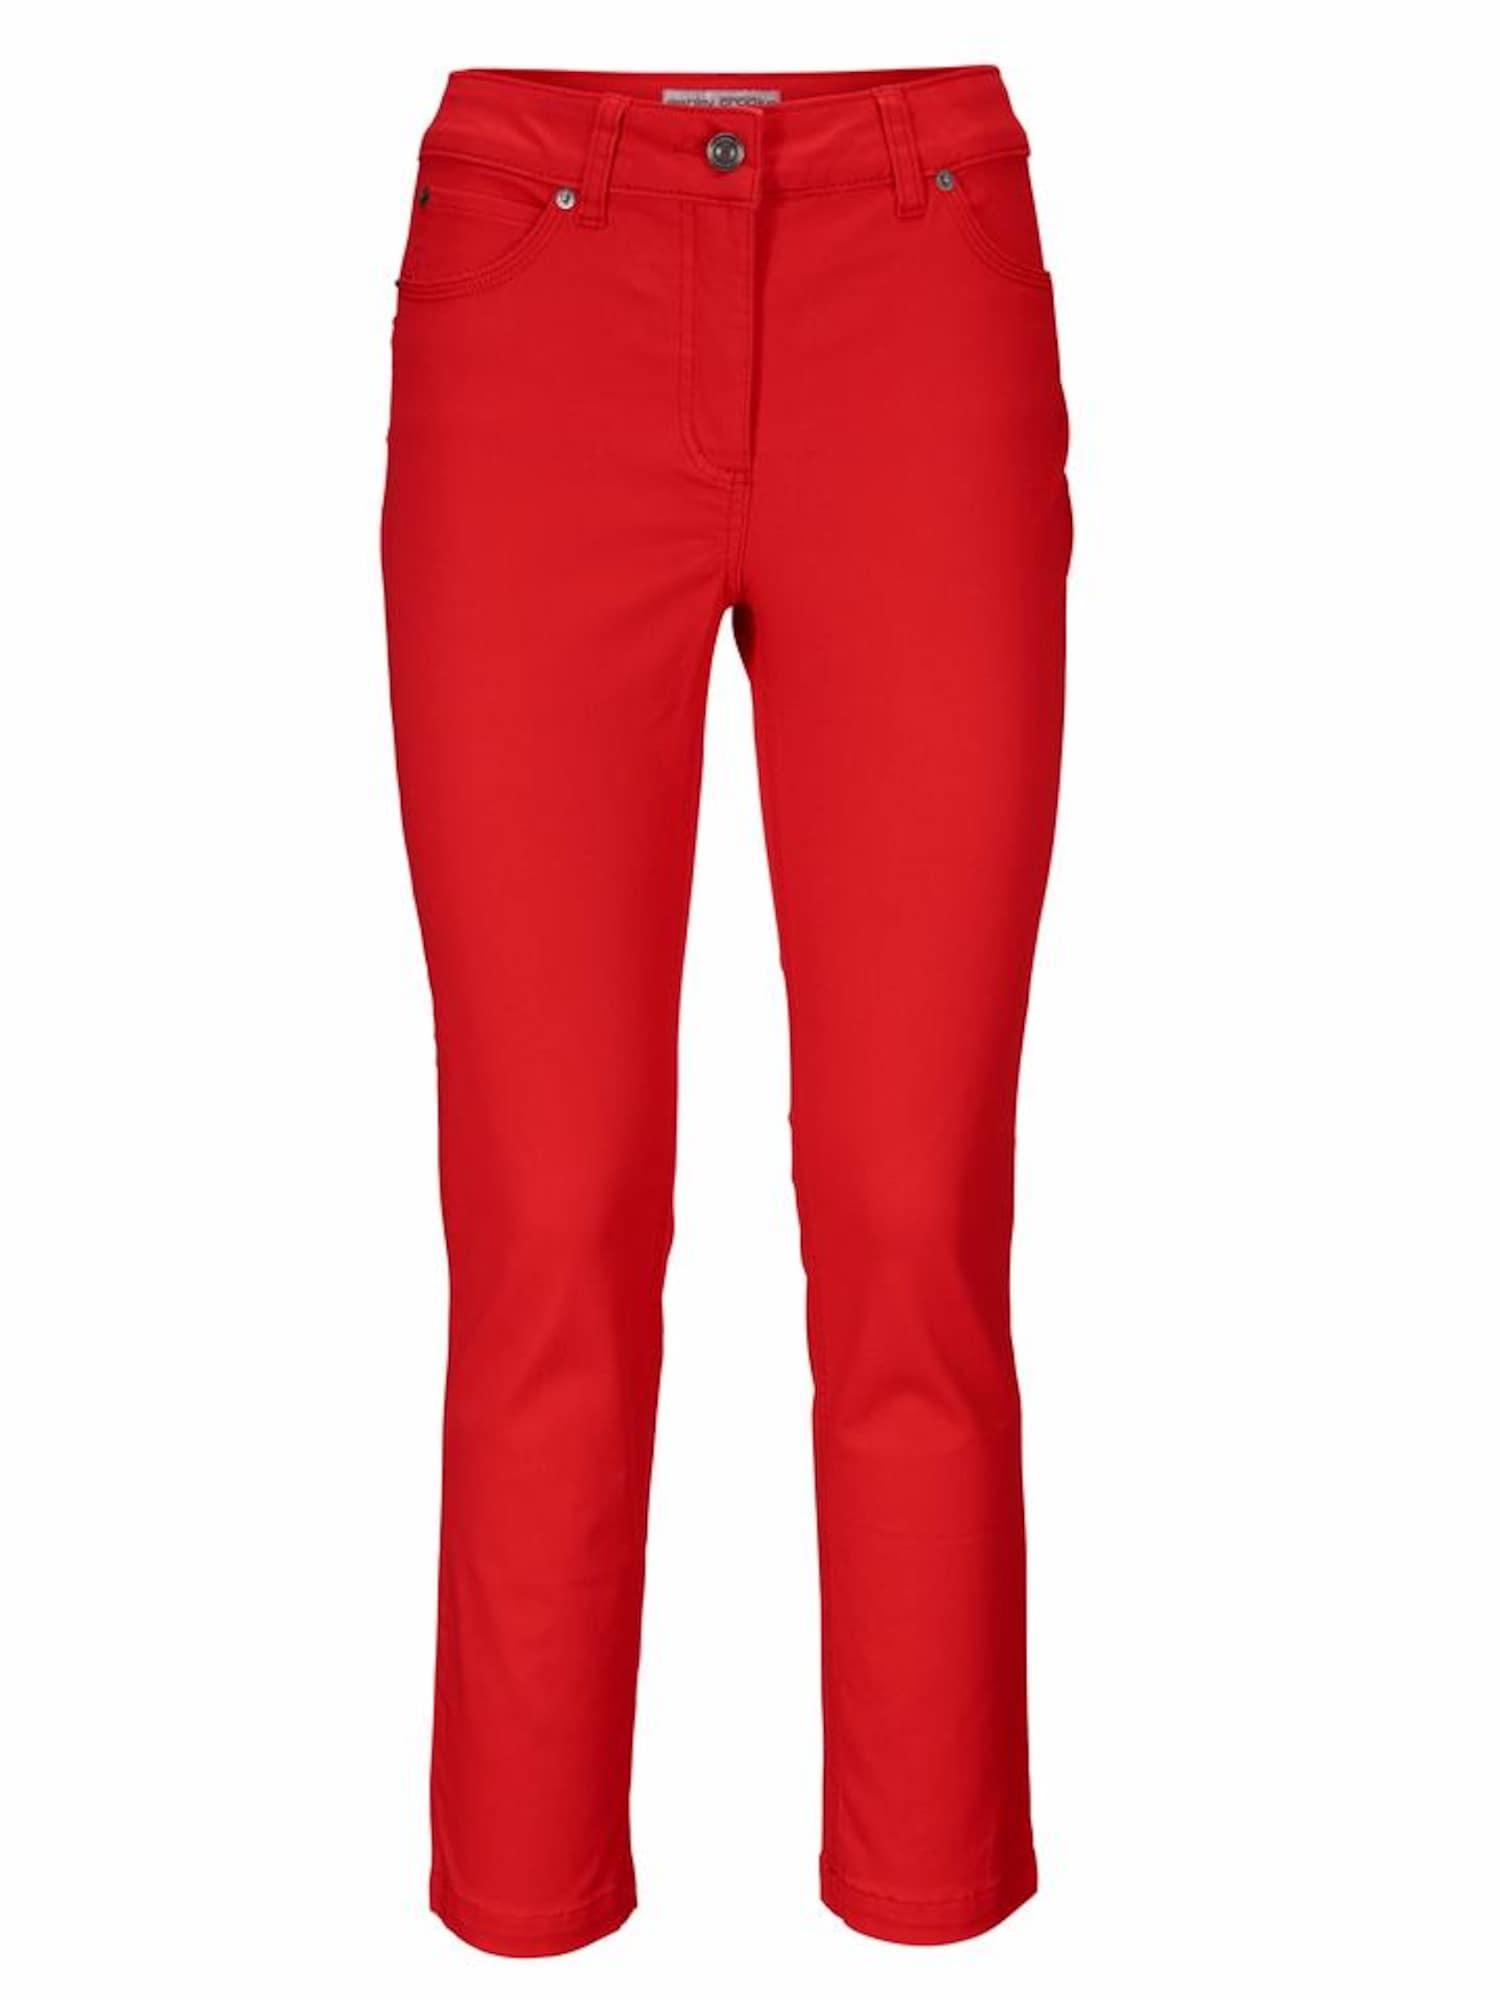 7/8-Jeans | Bekleidung > Jeans > 7/8-Jeans | Koralle | heine